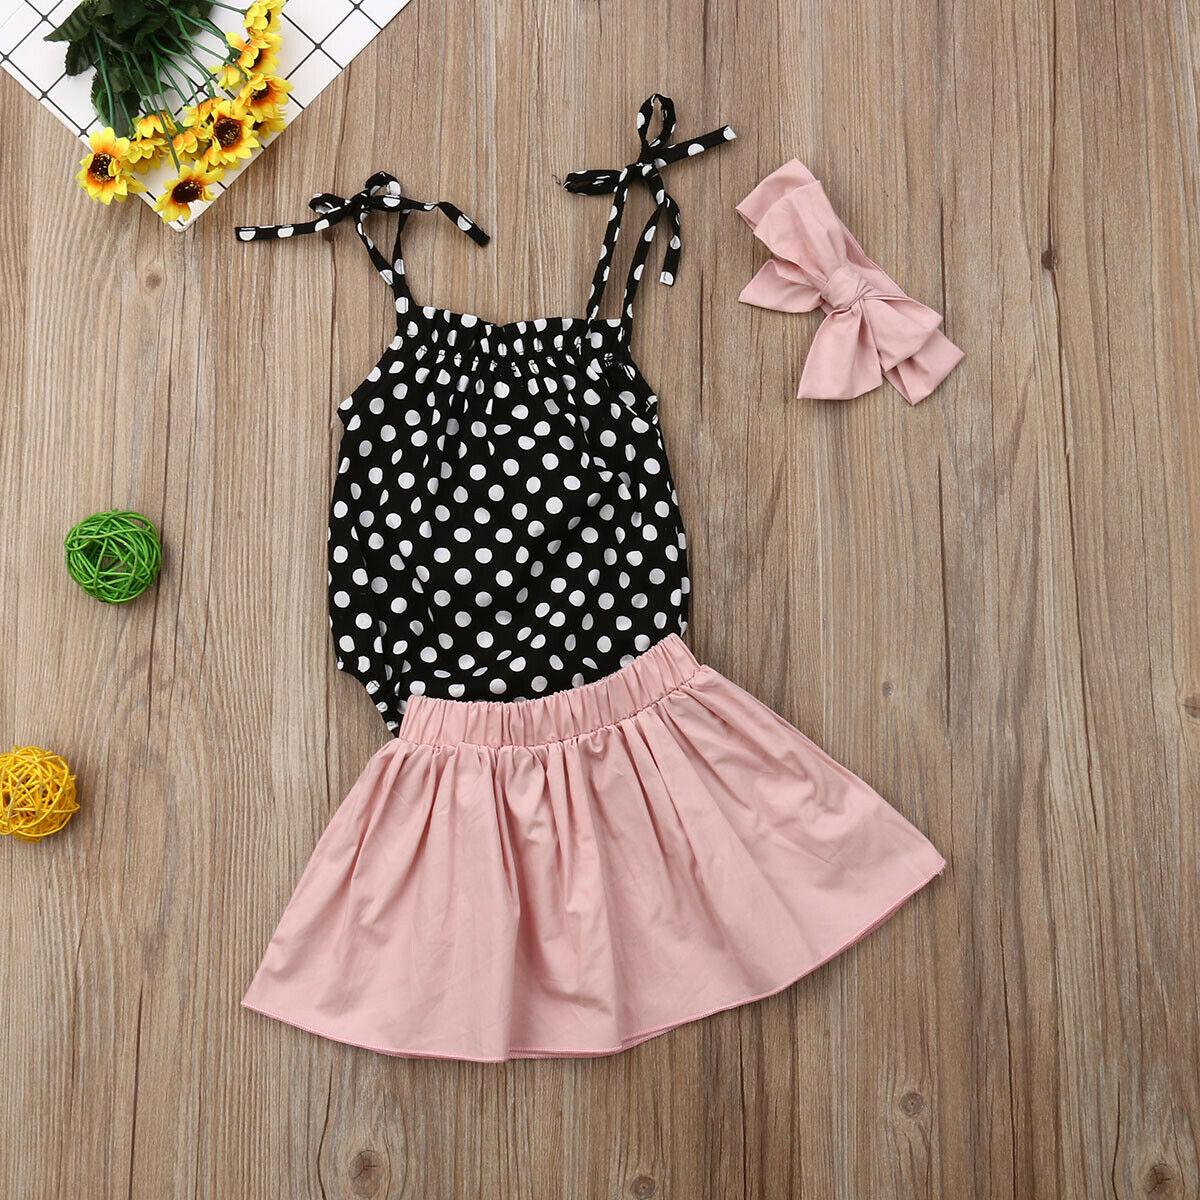 UK 2PCS Toddler Kids Baby Girls Summer Clothes Sling Tops+Skirt Dress Outfit Set